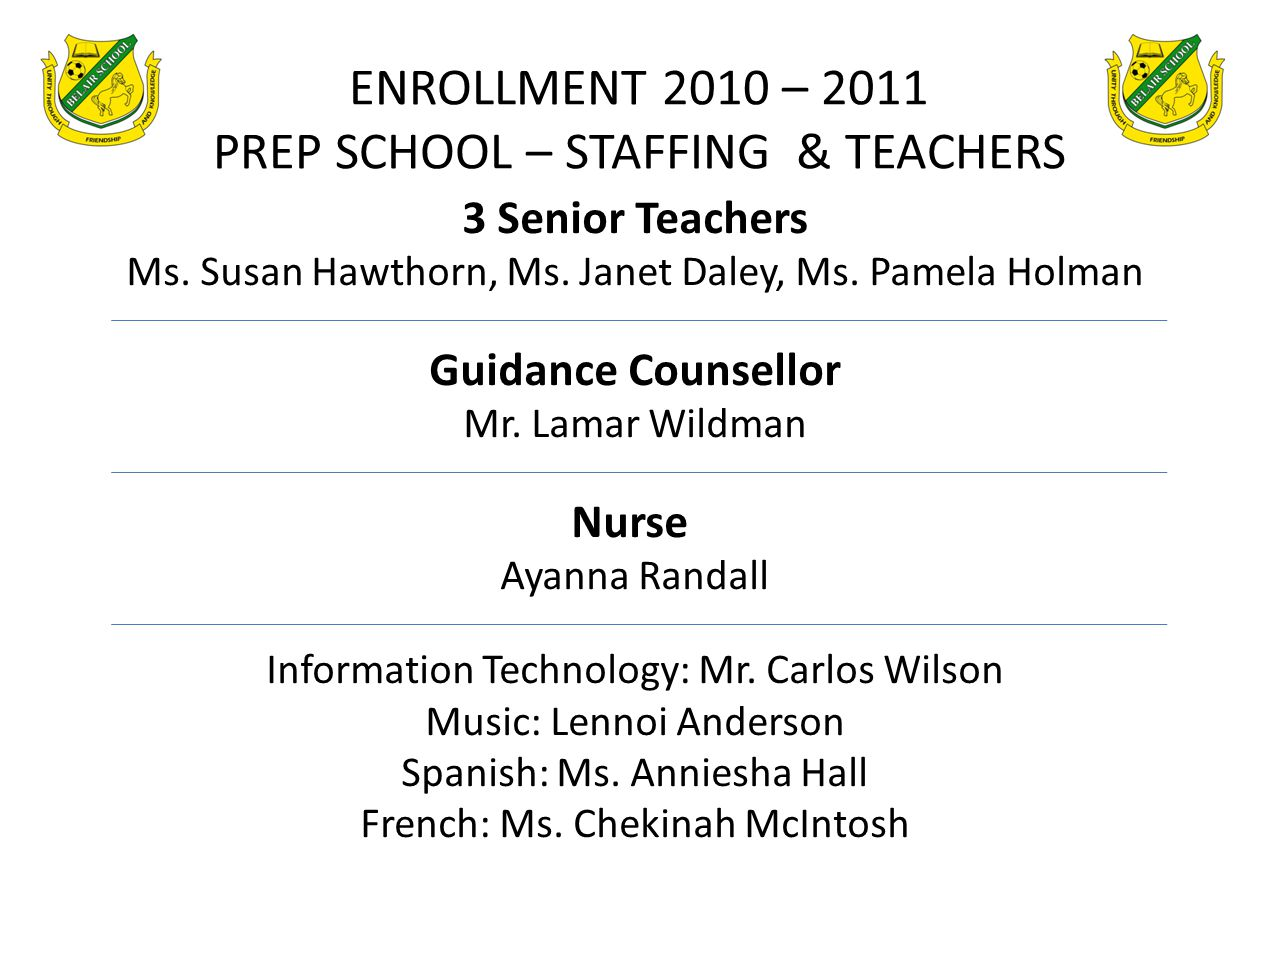 ENROLLMENT 2010 – 2011 PREP SCHOOL – STAFFING & TEACHERS 3 Senior Teachers Ms. Susan Hawthorn, Ms. Janet Daley, Ms. Pamela Holman Guidance Counsellor